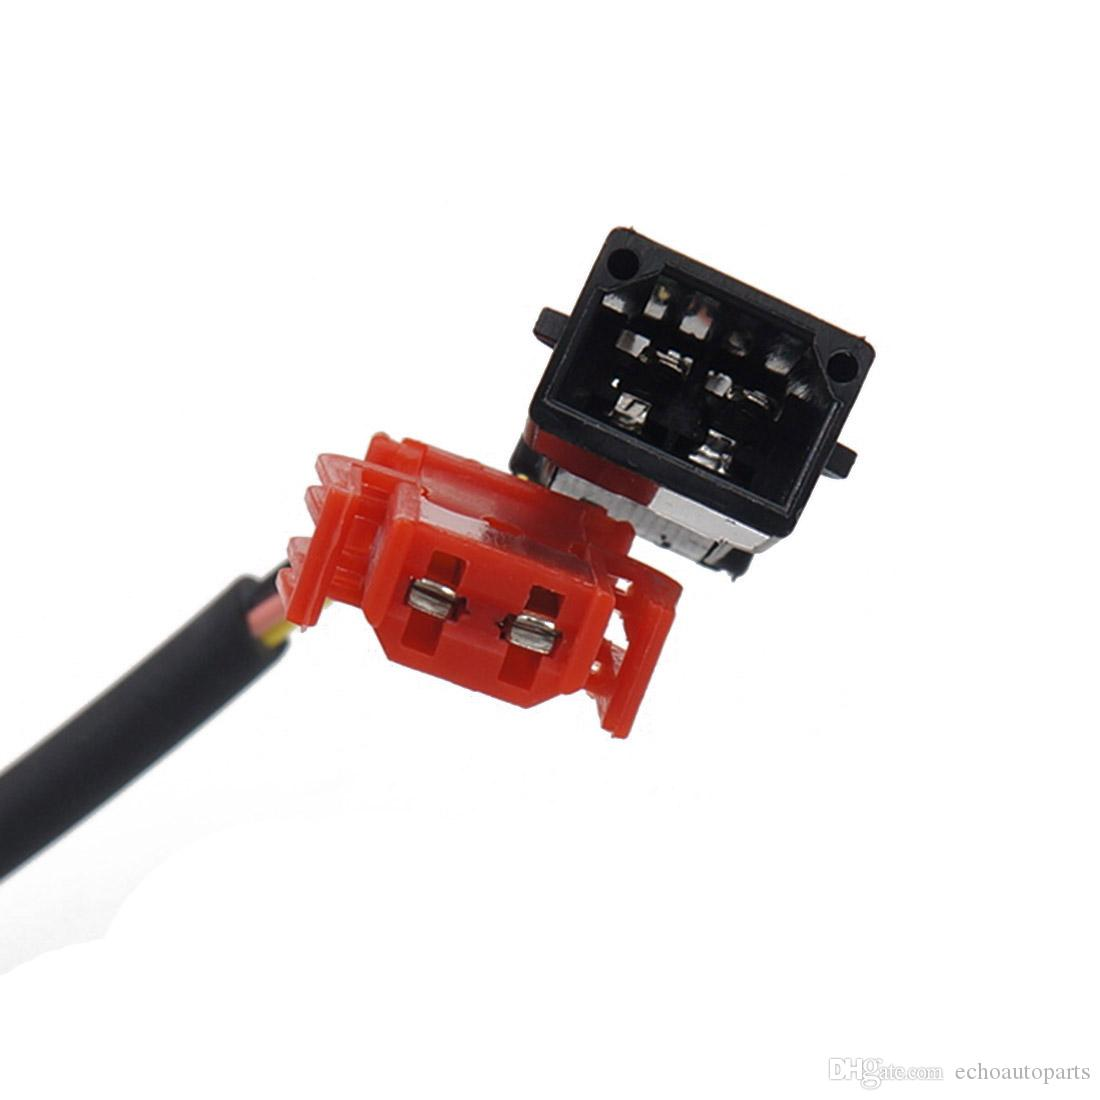 Marke neue Vorne ABS Raddrehzahlsensor Für Audi A4 / A4 Quattro / VW Passat 8D0927803D 4B0927803C